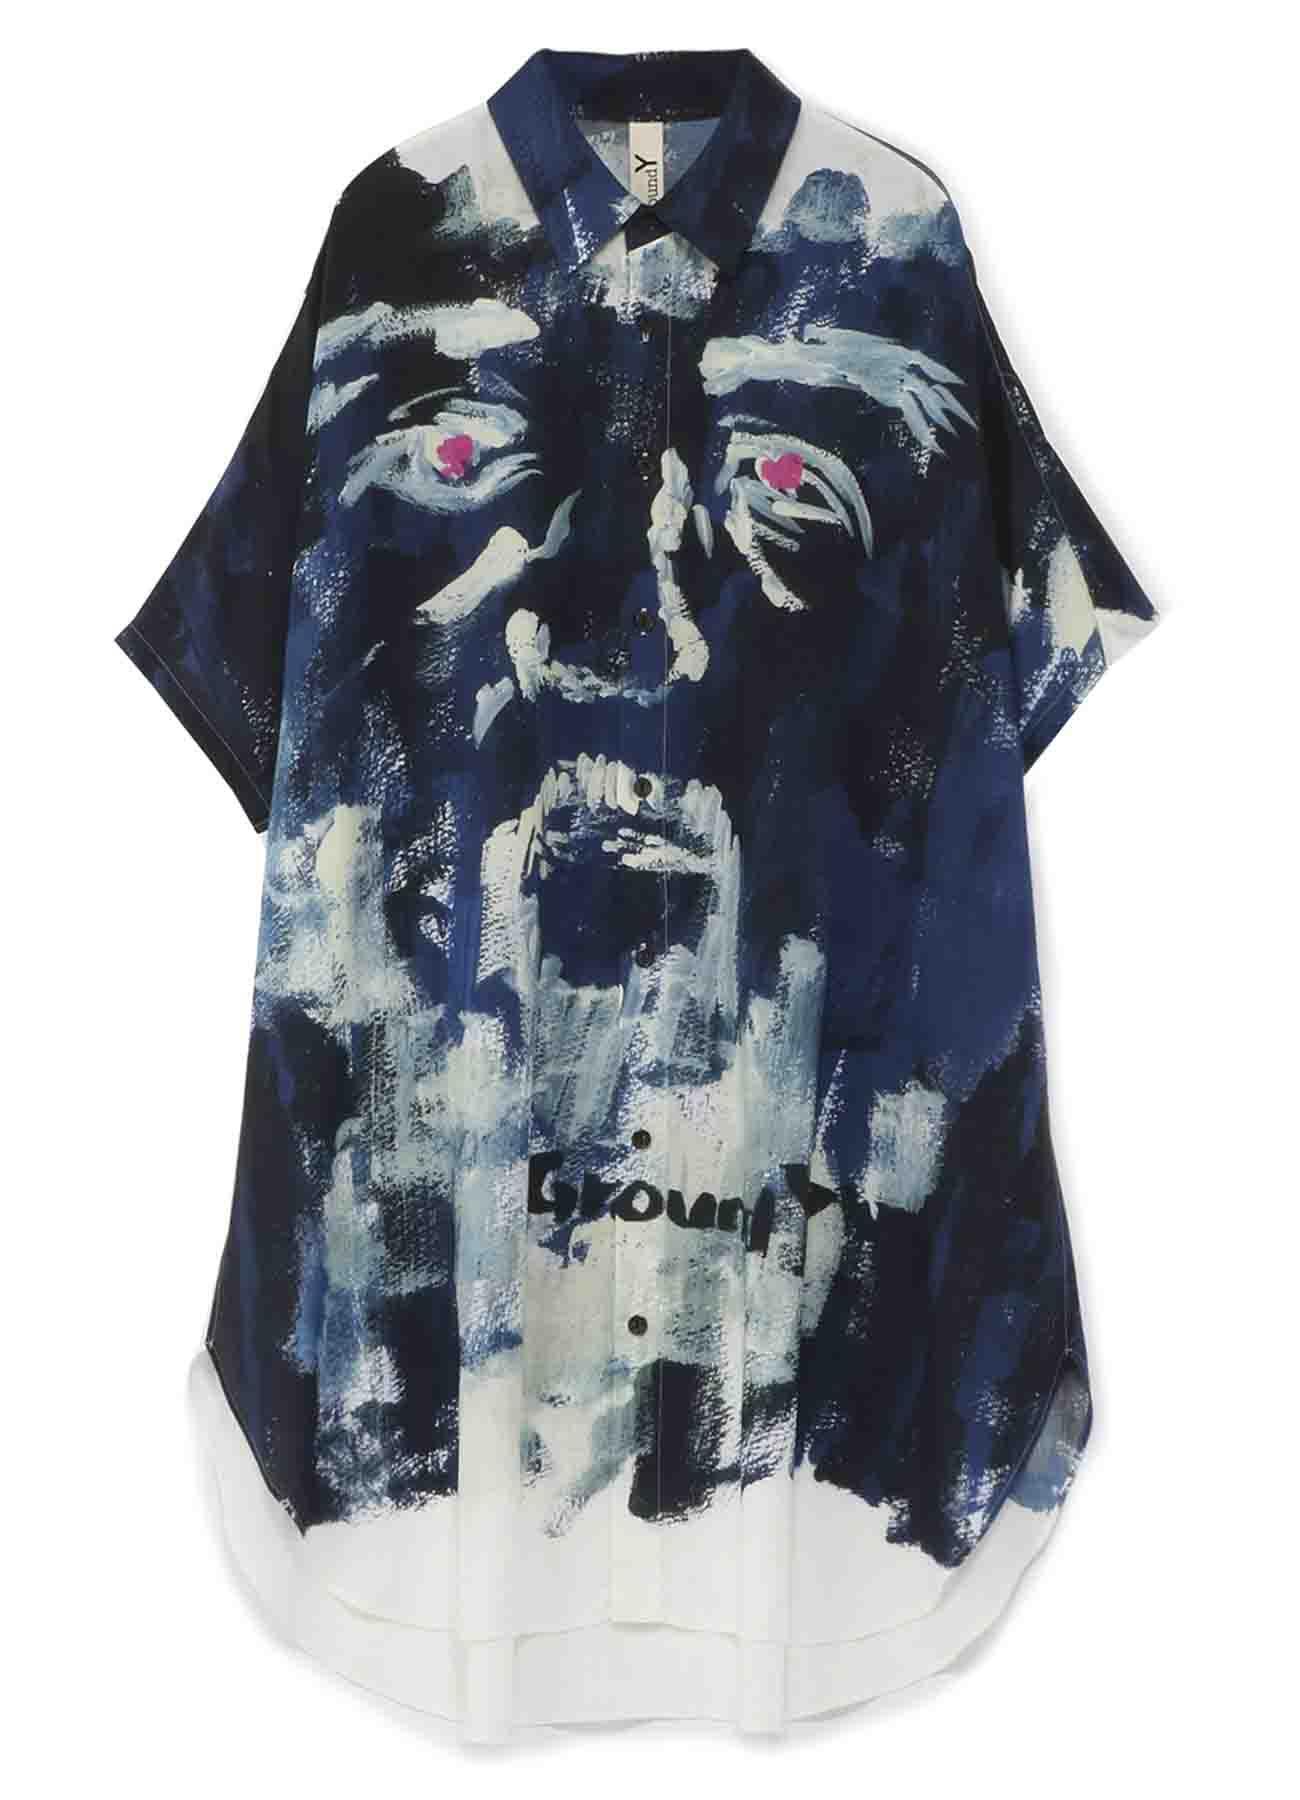 【Ground Y×NON Collaboration】Dolman Short Sleeves Shirt B